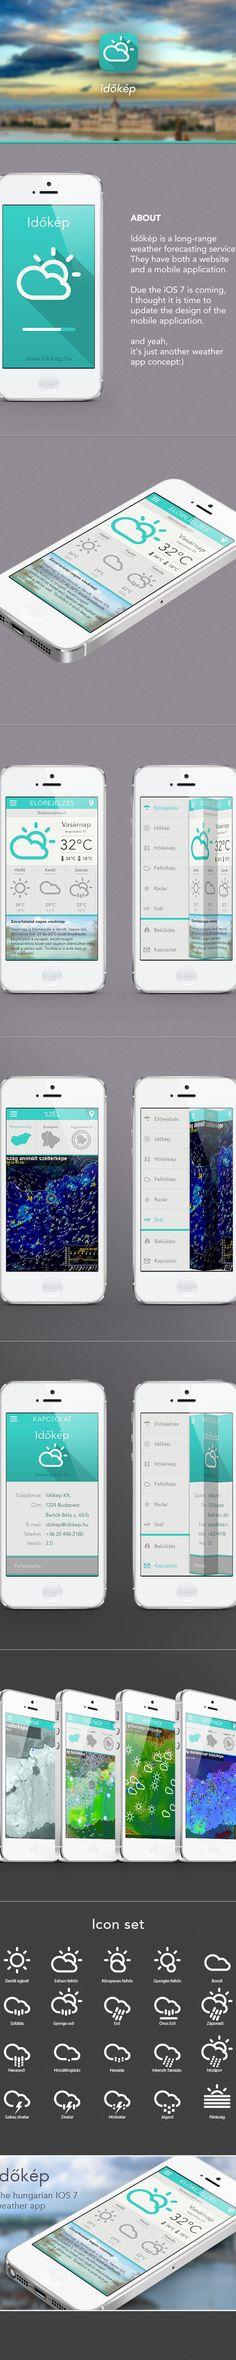 Időkép - weather app redesign by Attila Szabó